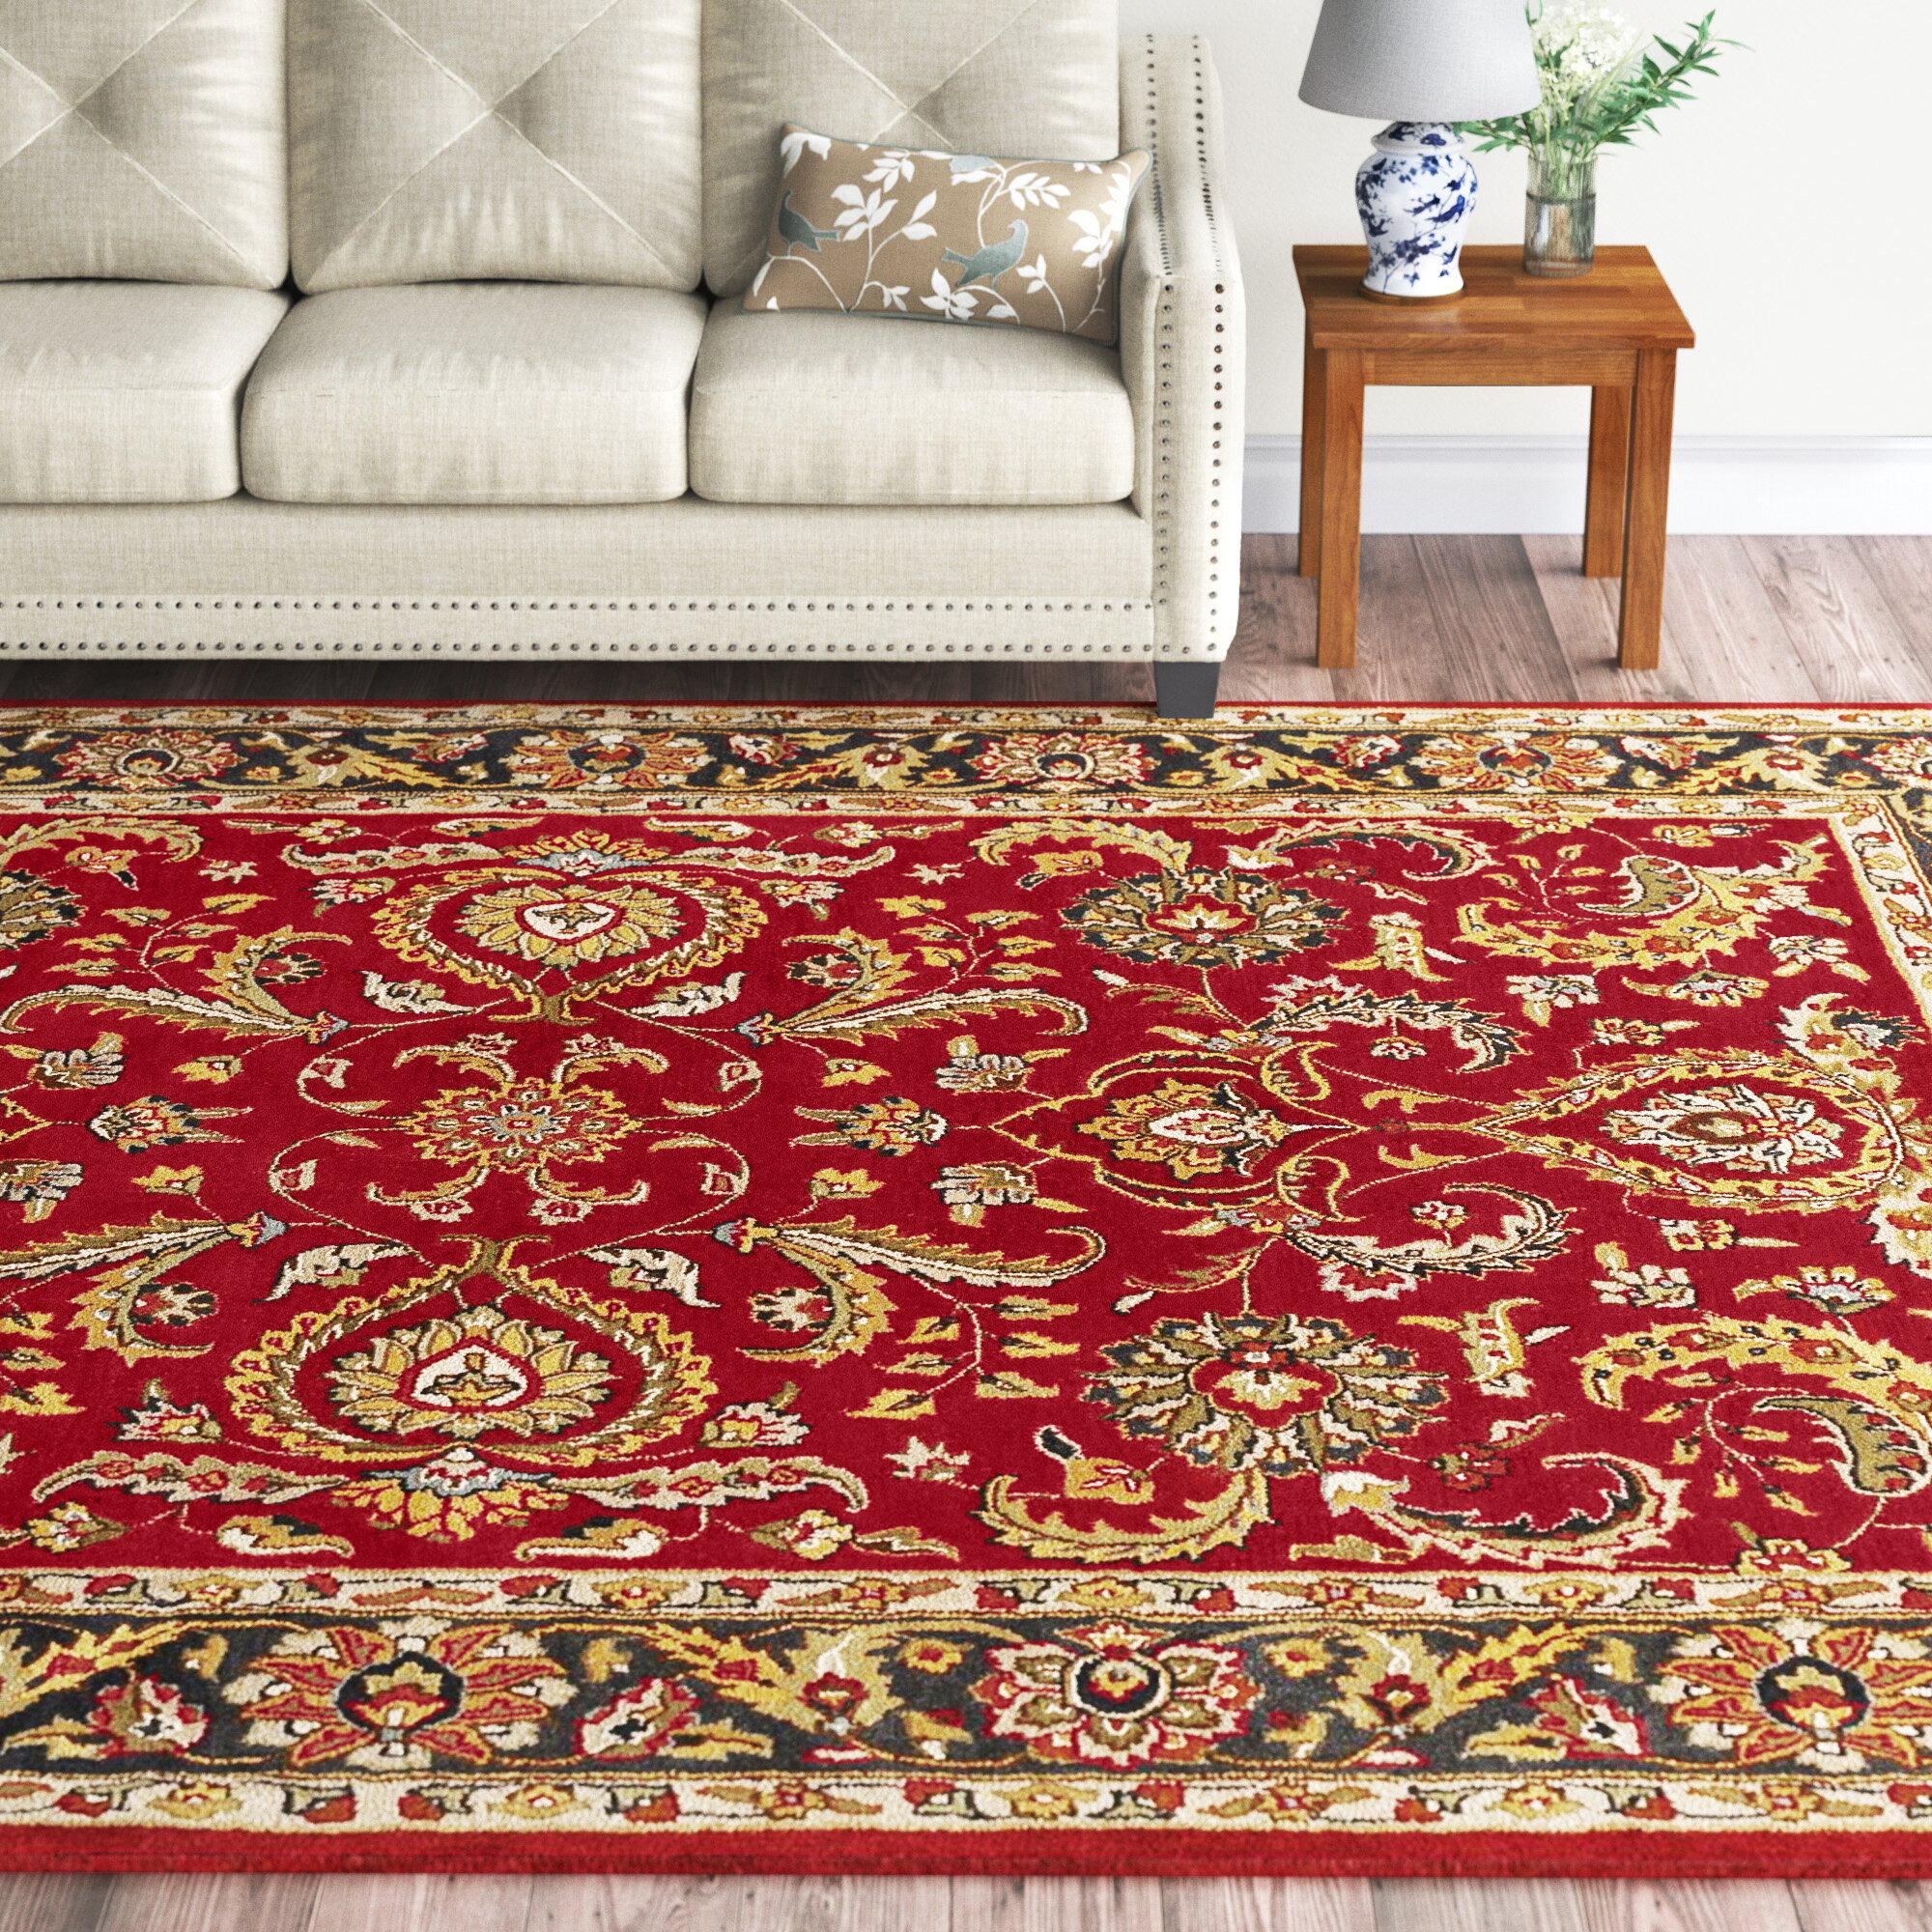 Birch Lane Elkhorn Oriental Handmade Tufted Wool Red Charcoal Area Rug Reviews Wayfair